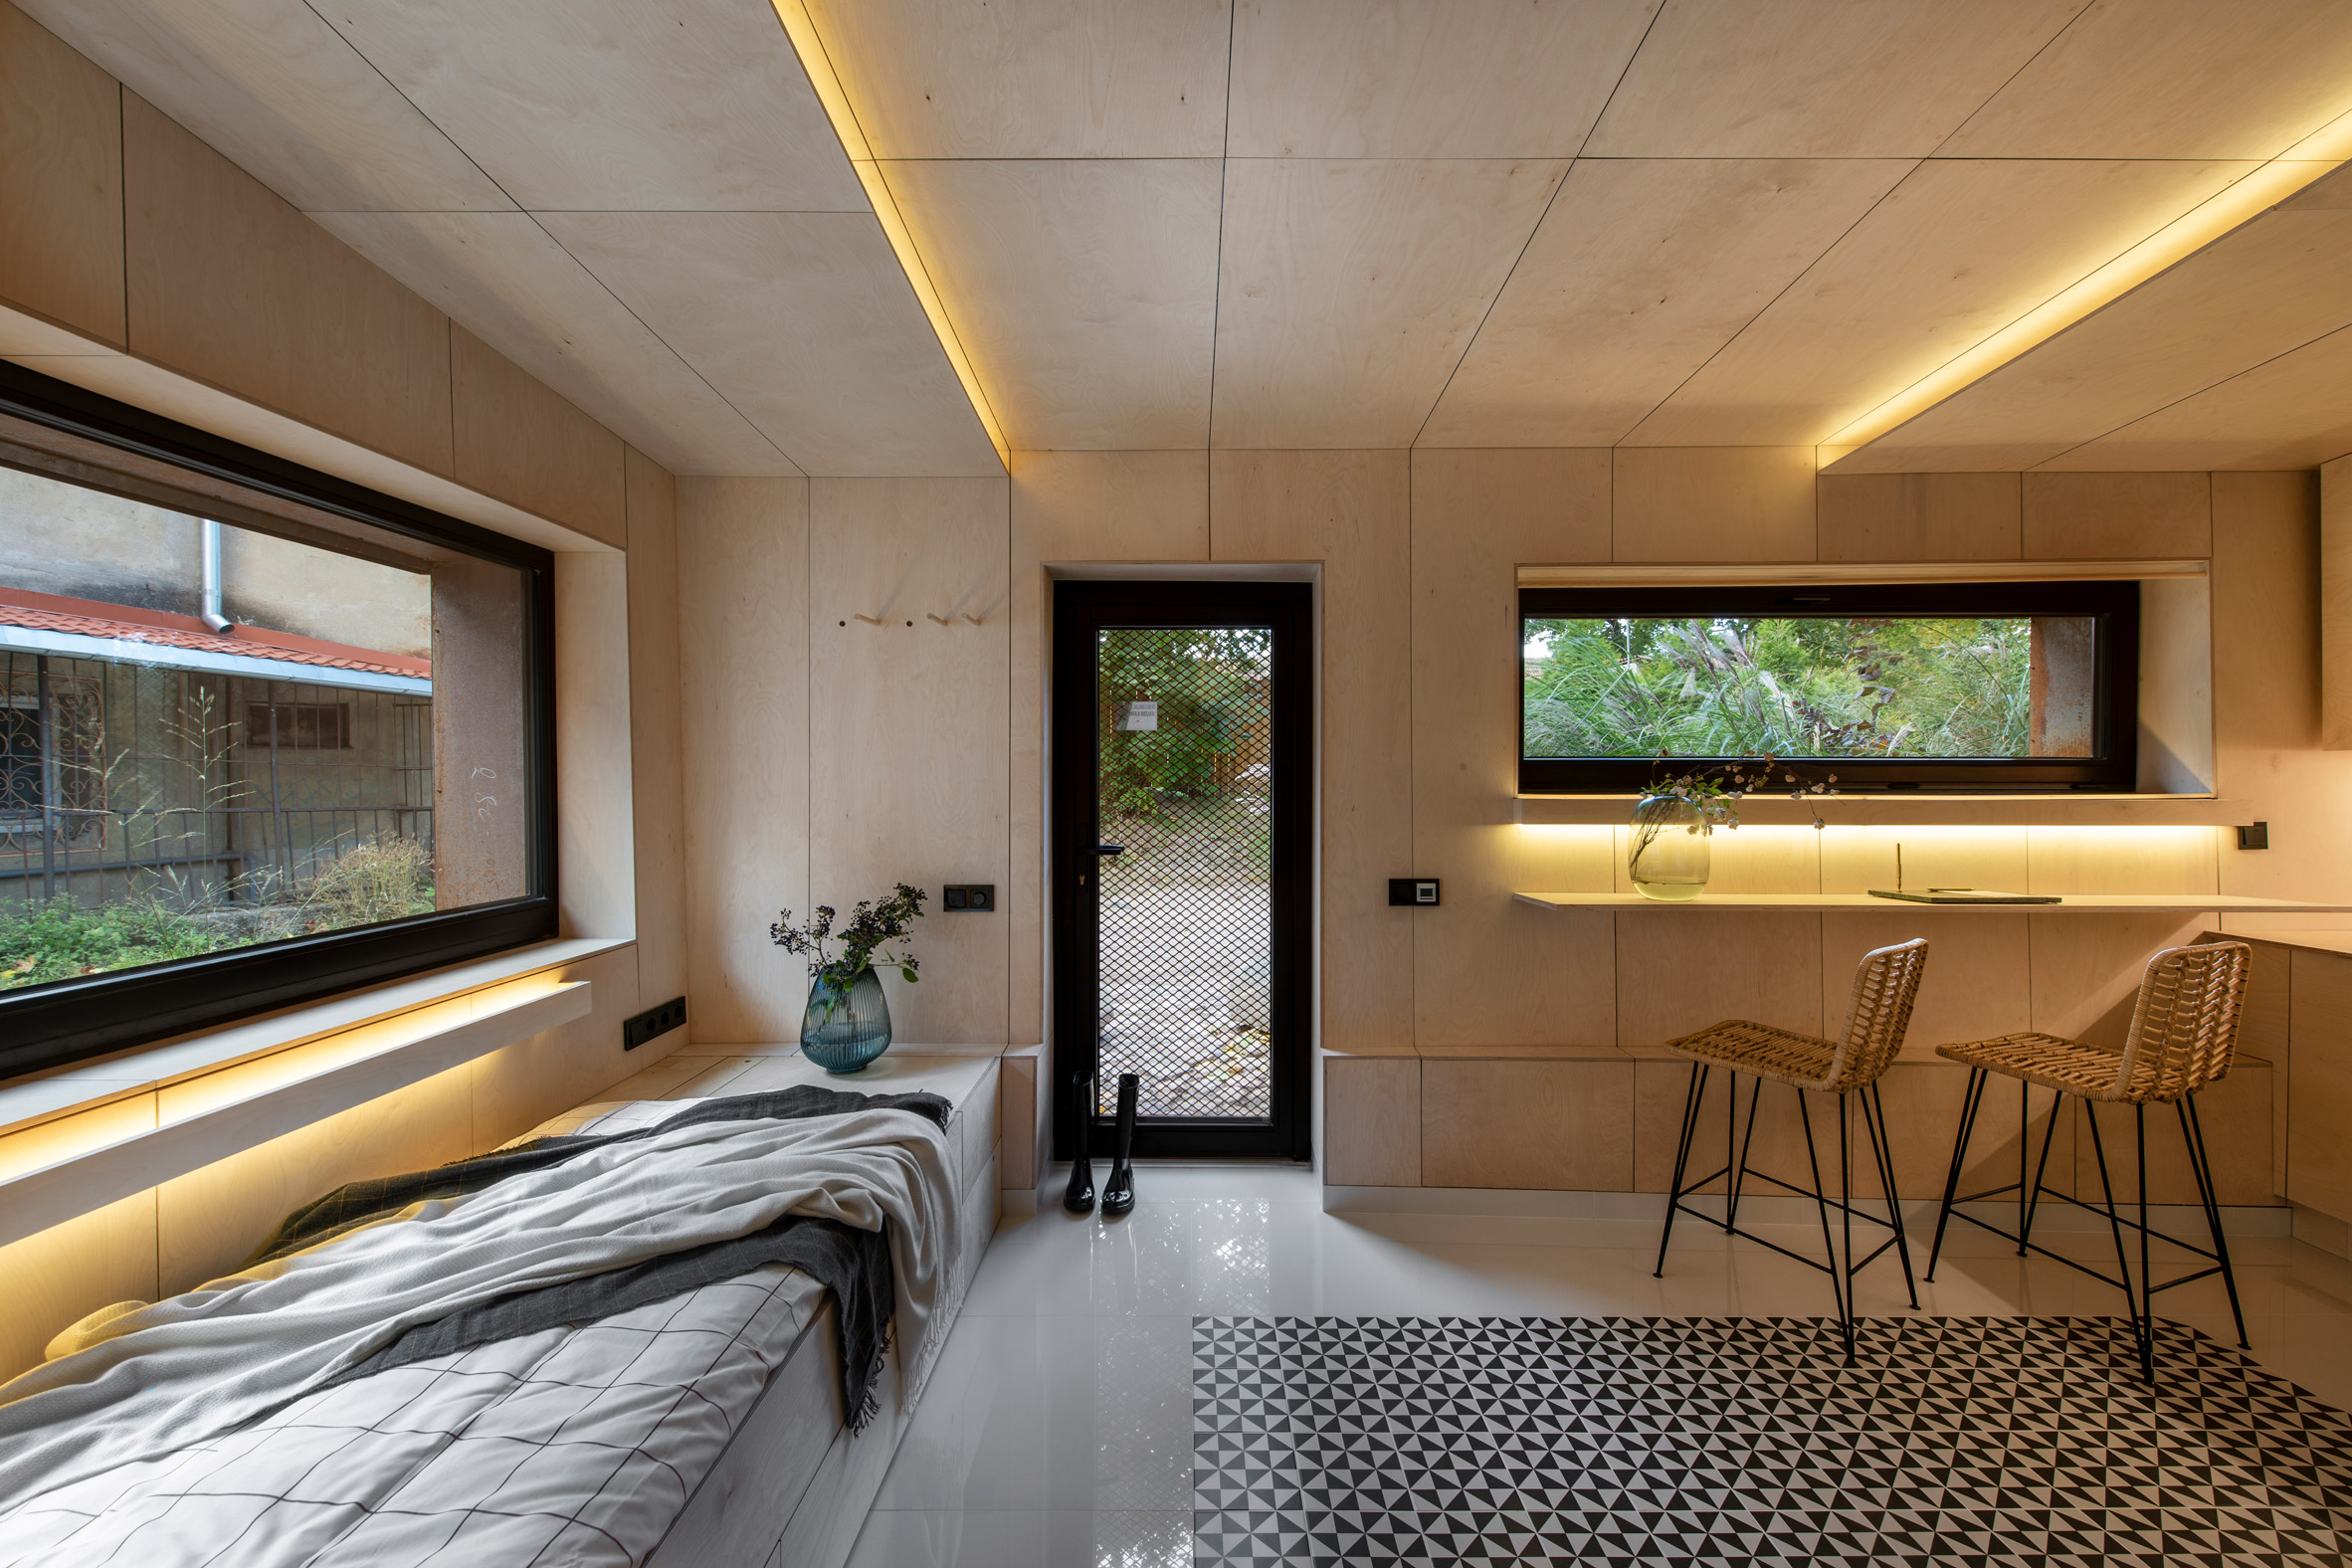 Shabby garage transformed into an impressive micro home